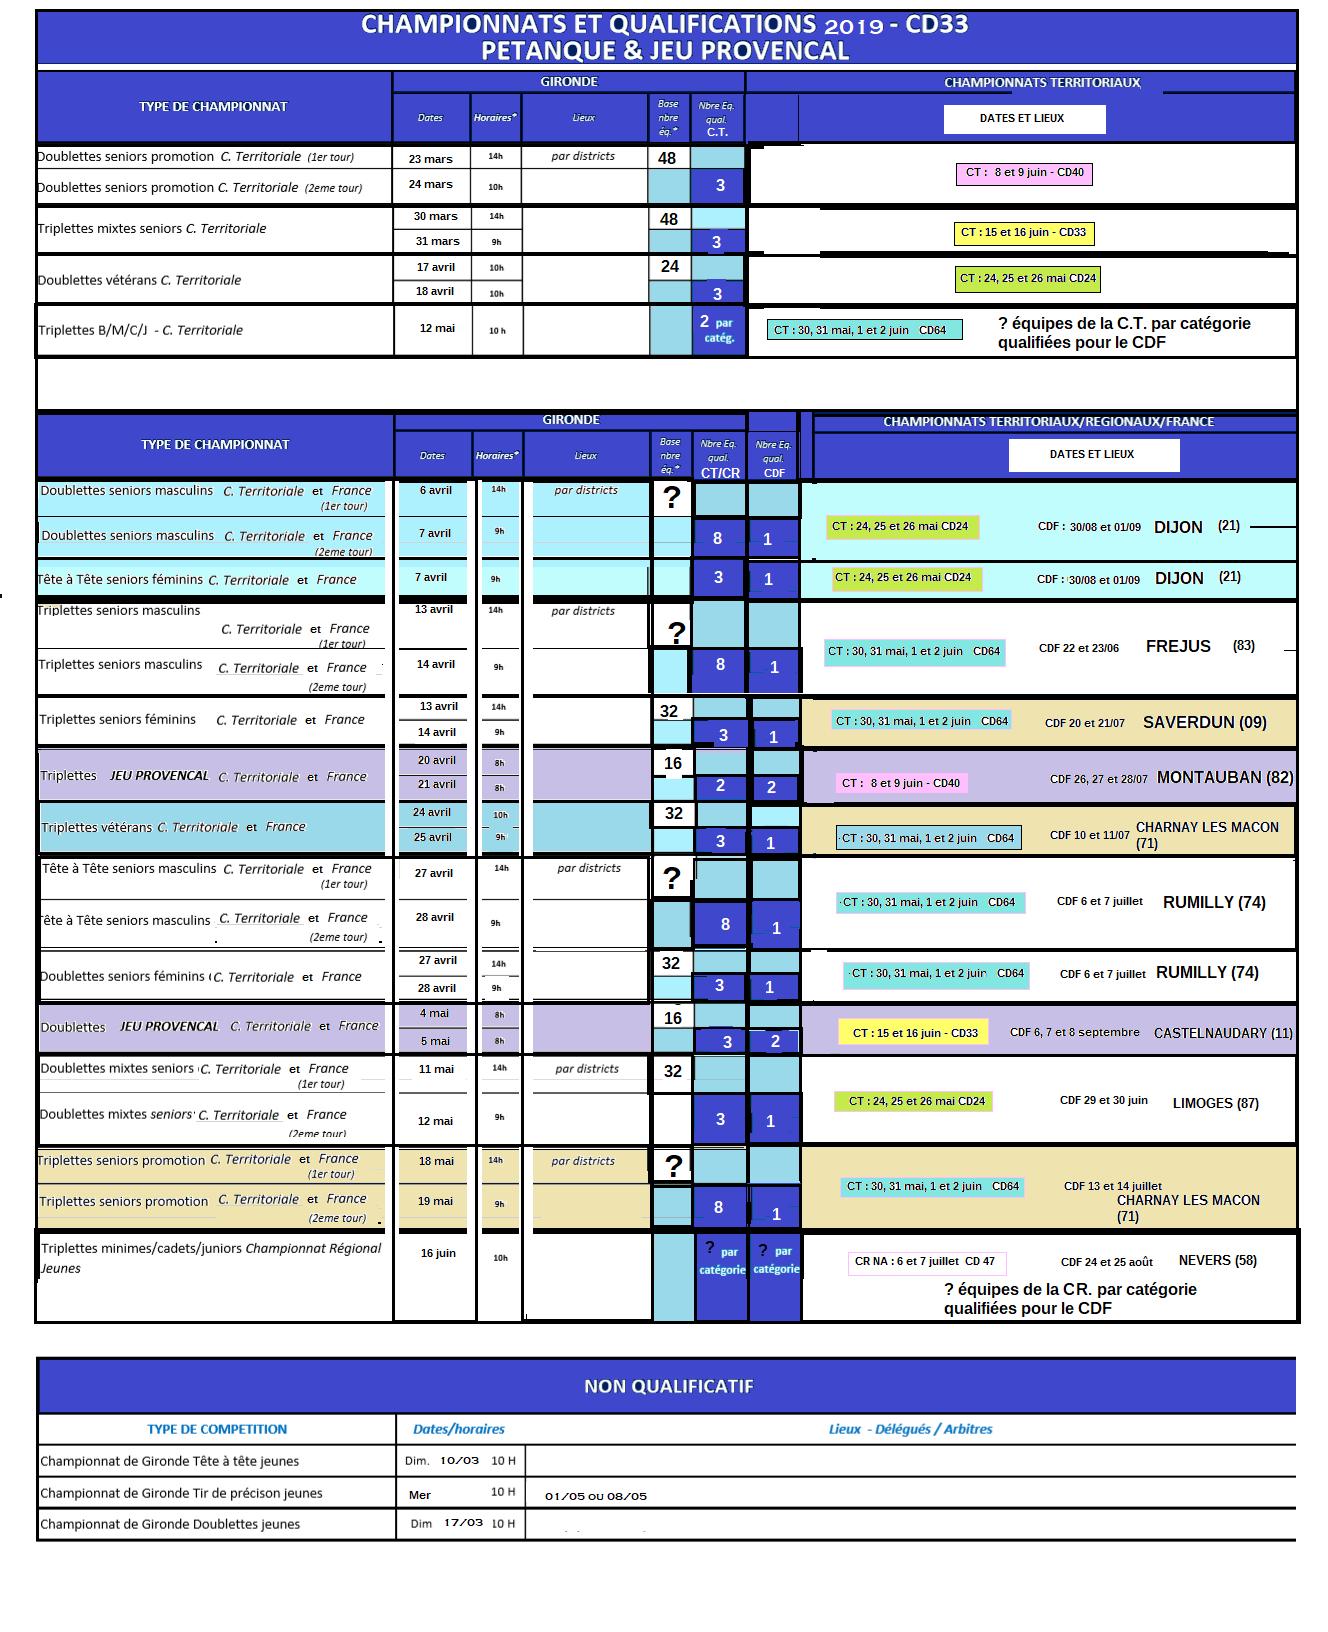 Annexe ii qualifications 2019